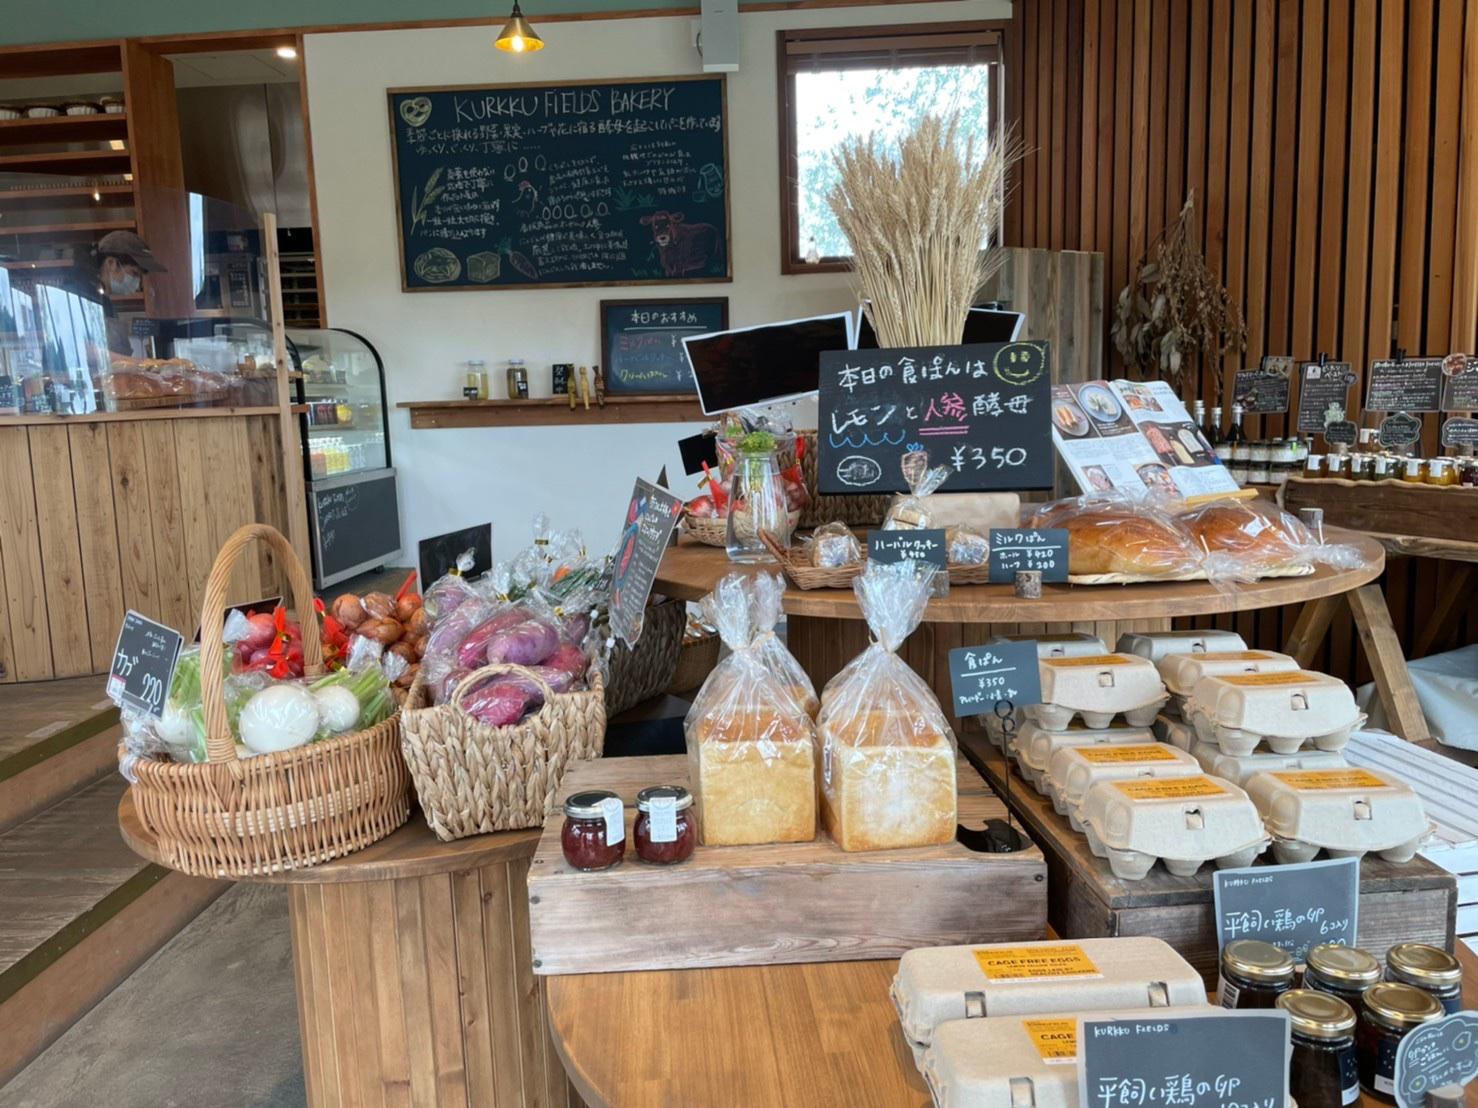 KURKKU FIELDS BAKERYはパン以外に野菜、ジャム、卵なども購入可能